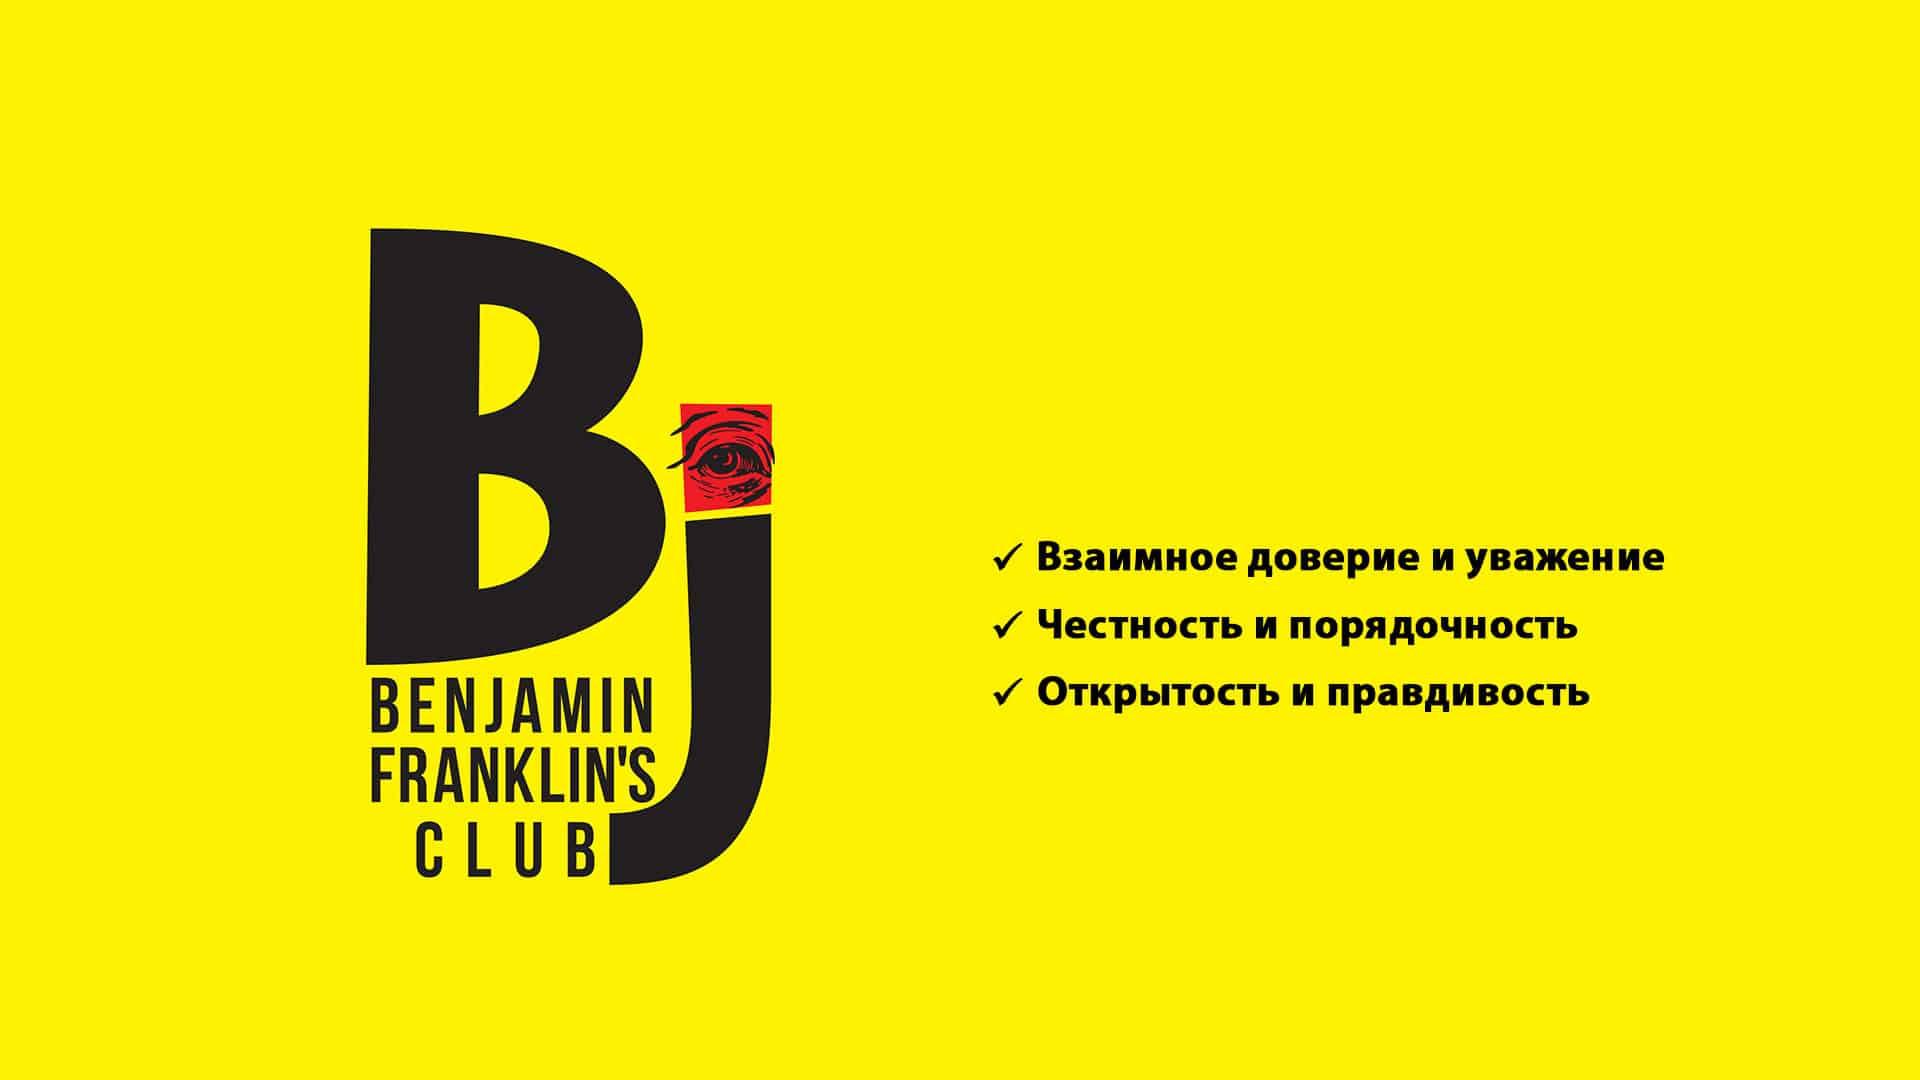 Benjamin Franklin Club